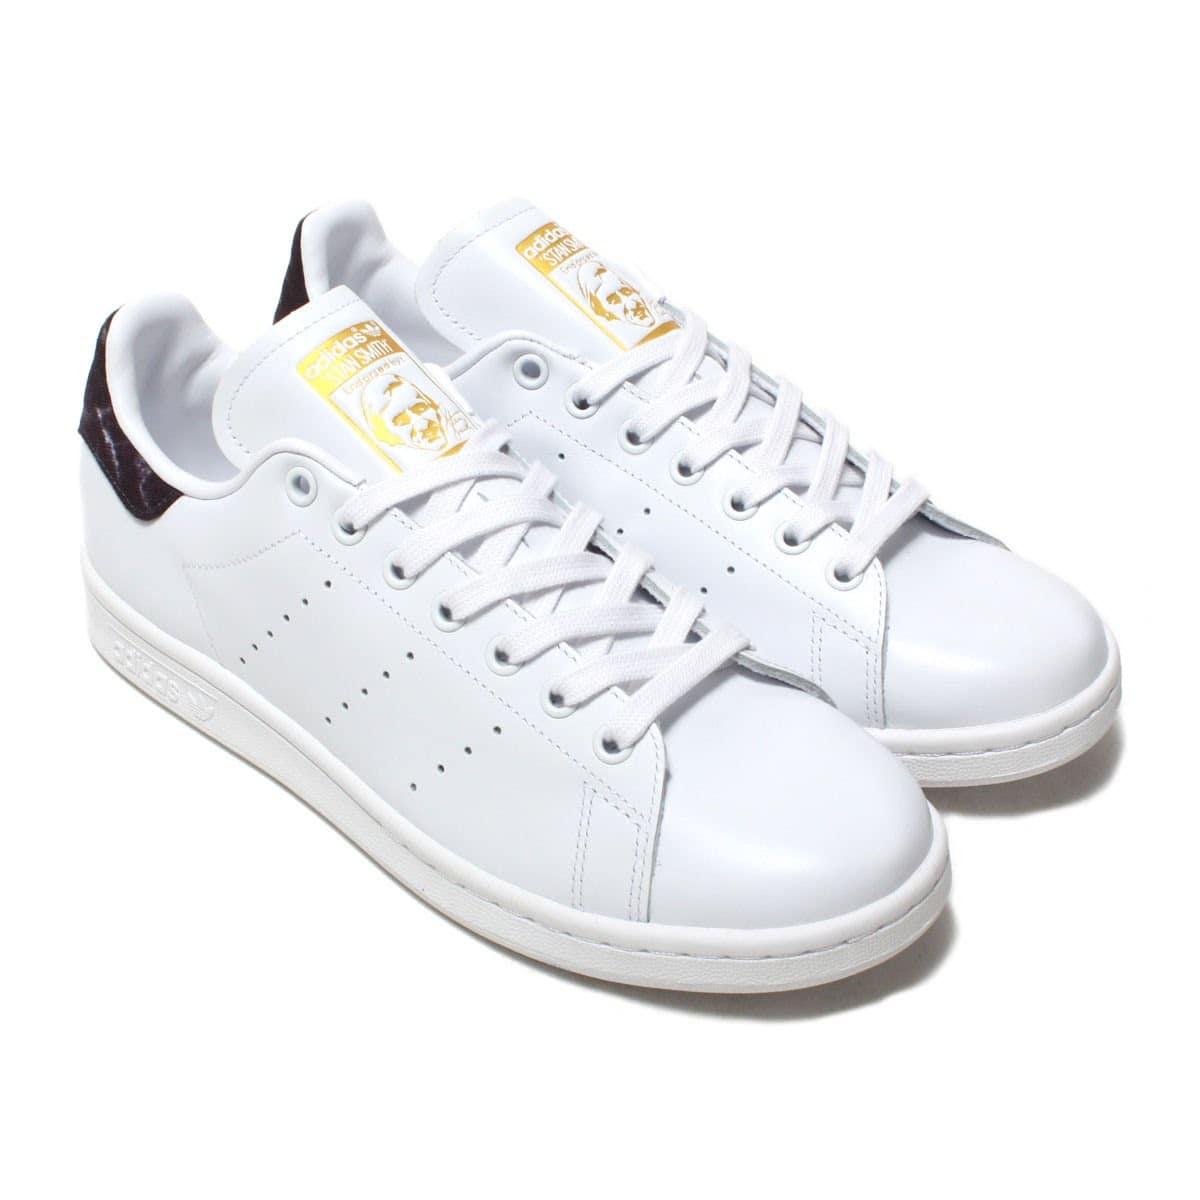 adidas Originals Stan Smith  RUNNING WHITE/CORE BLACK/GOLD MET_photo_large